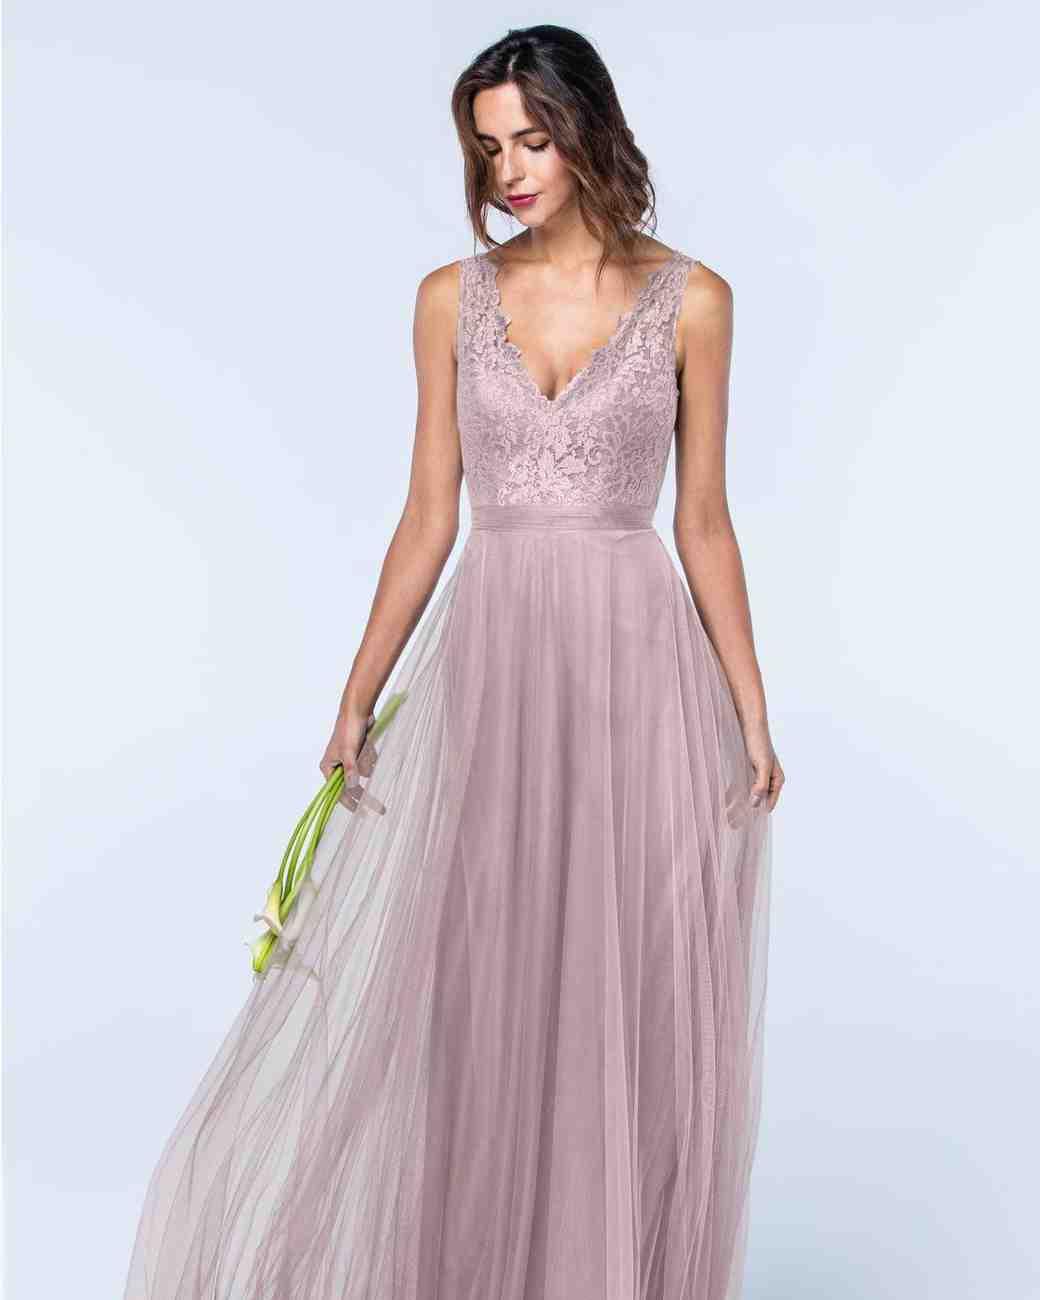 Lac Dress with Sash Bridesmaids